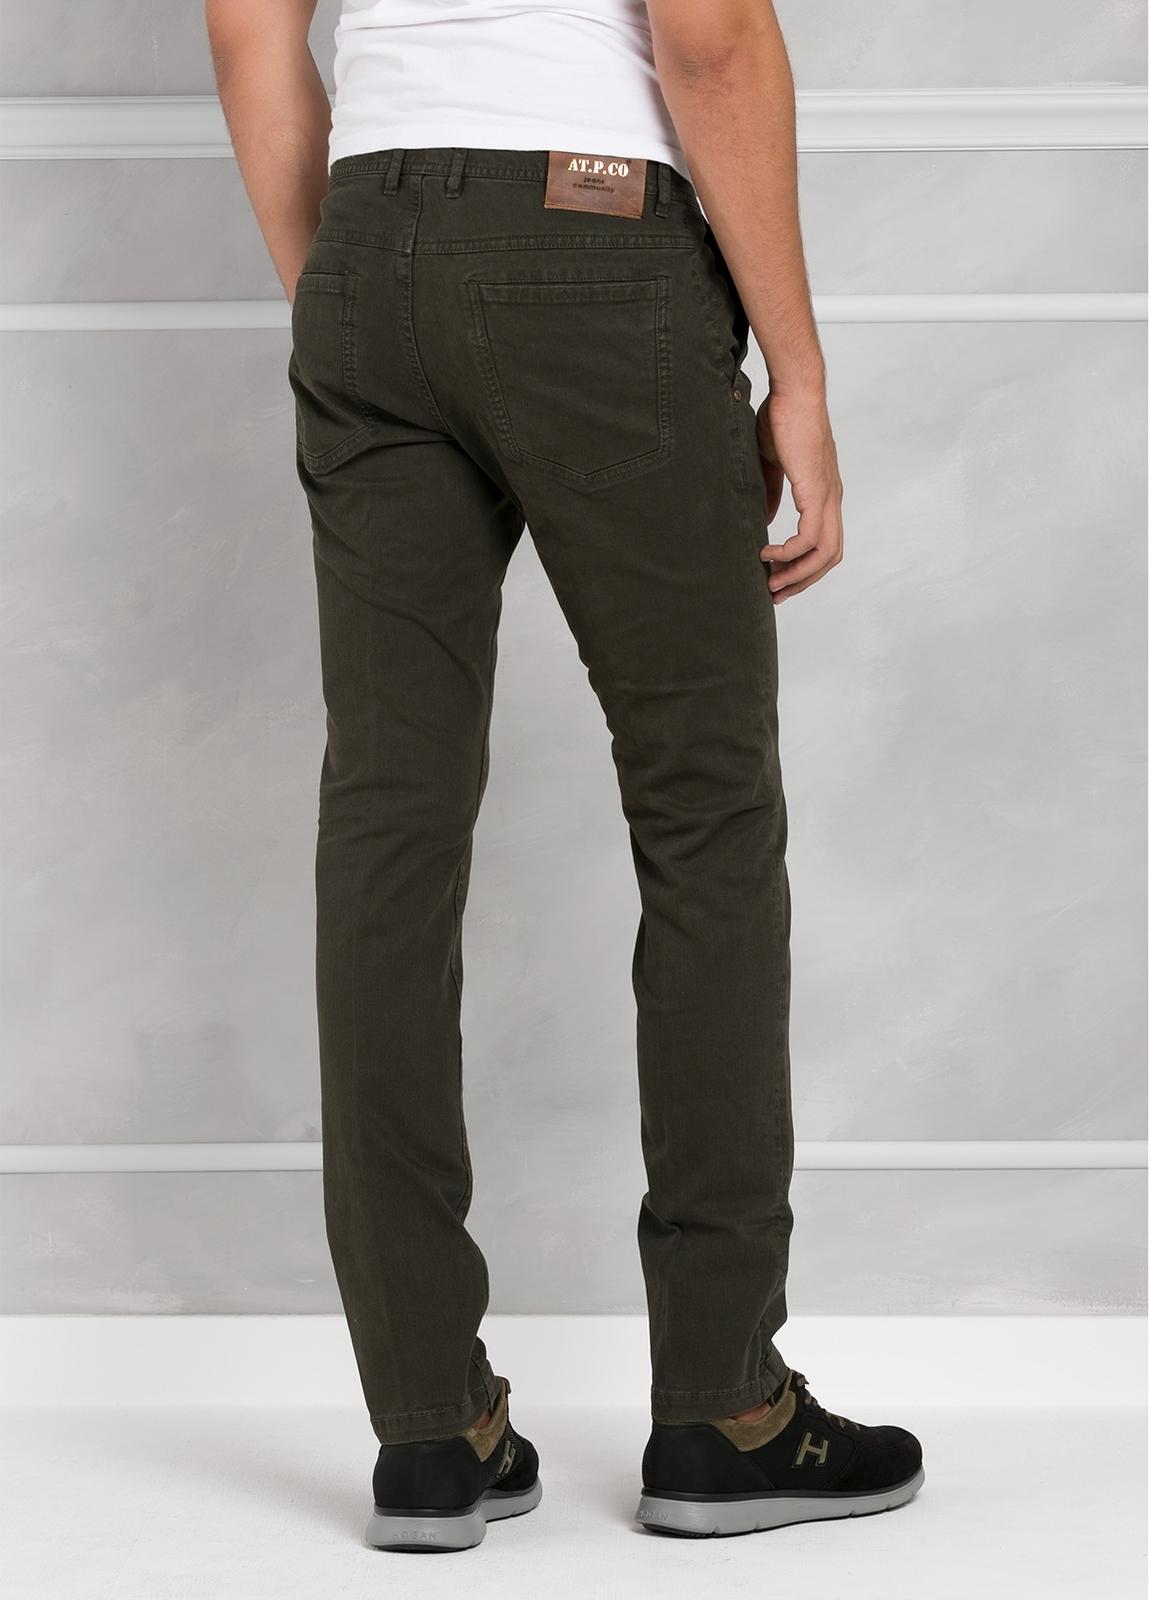 Pantalón 5 bolsillos modelo BRAD 01 color kaki. 97% Algodón 3% Elastán. - Ítem2